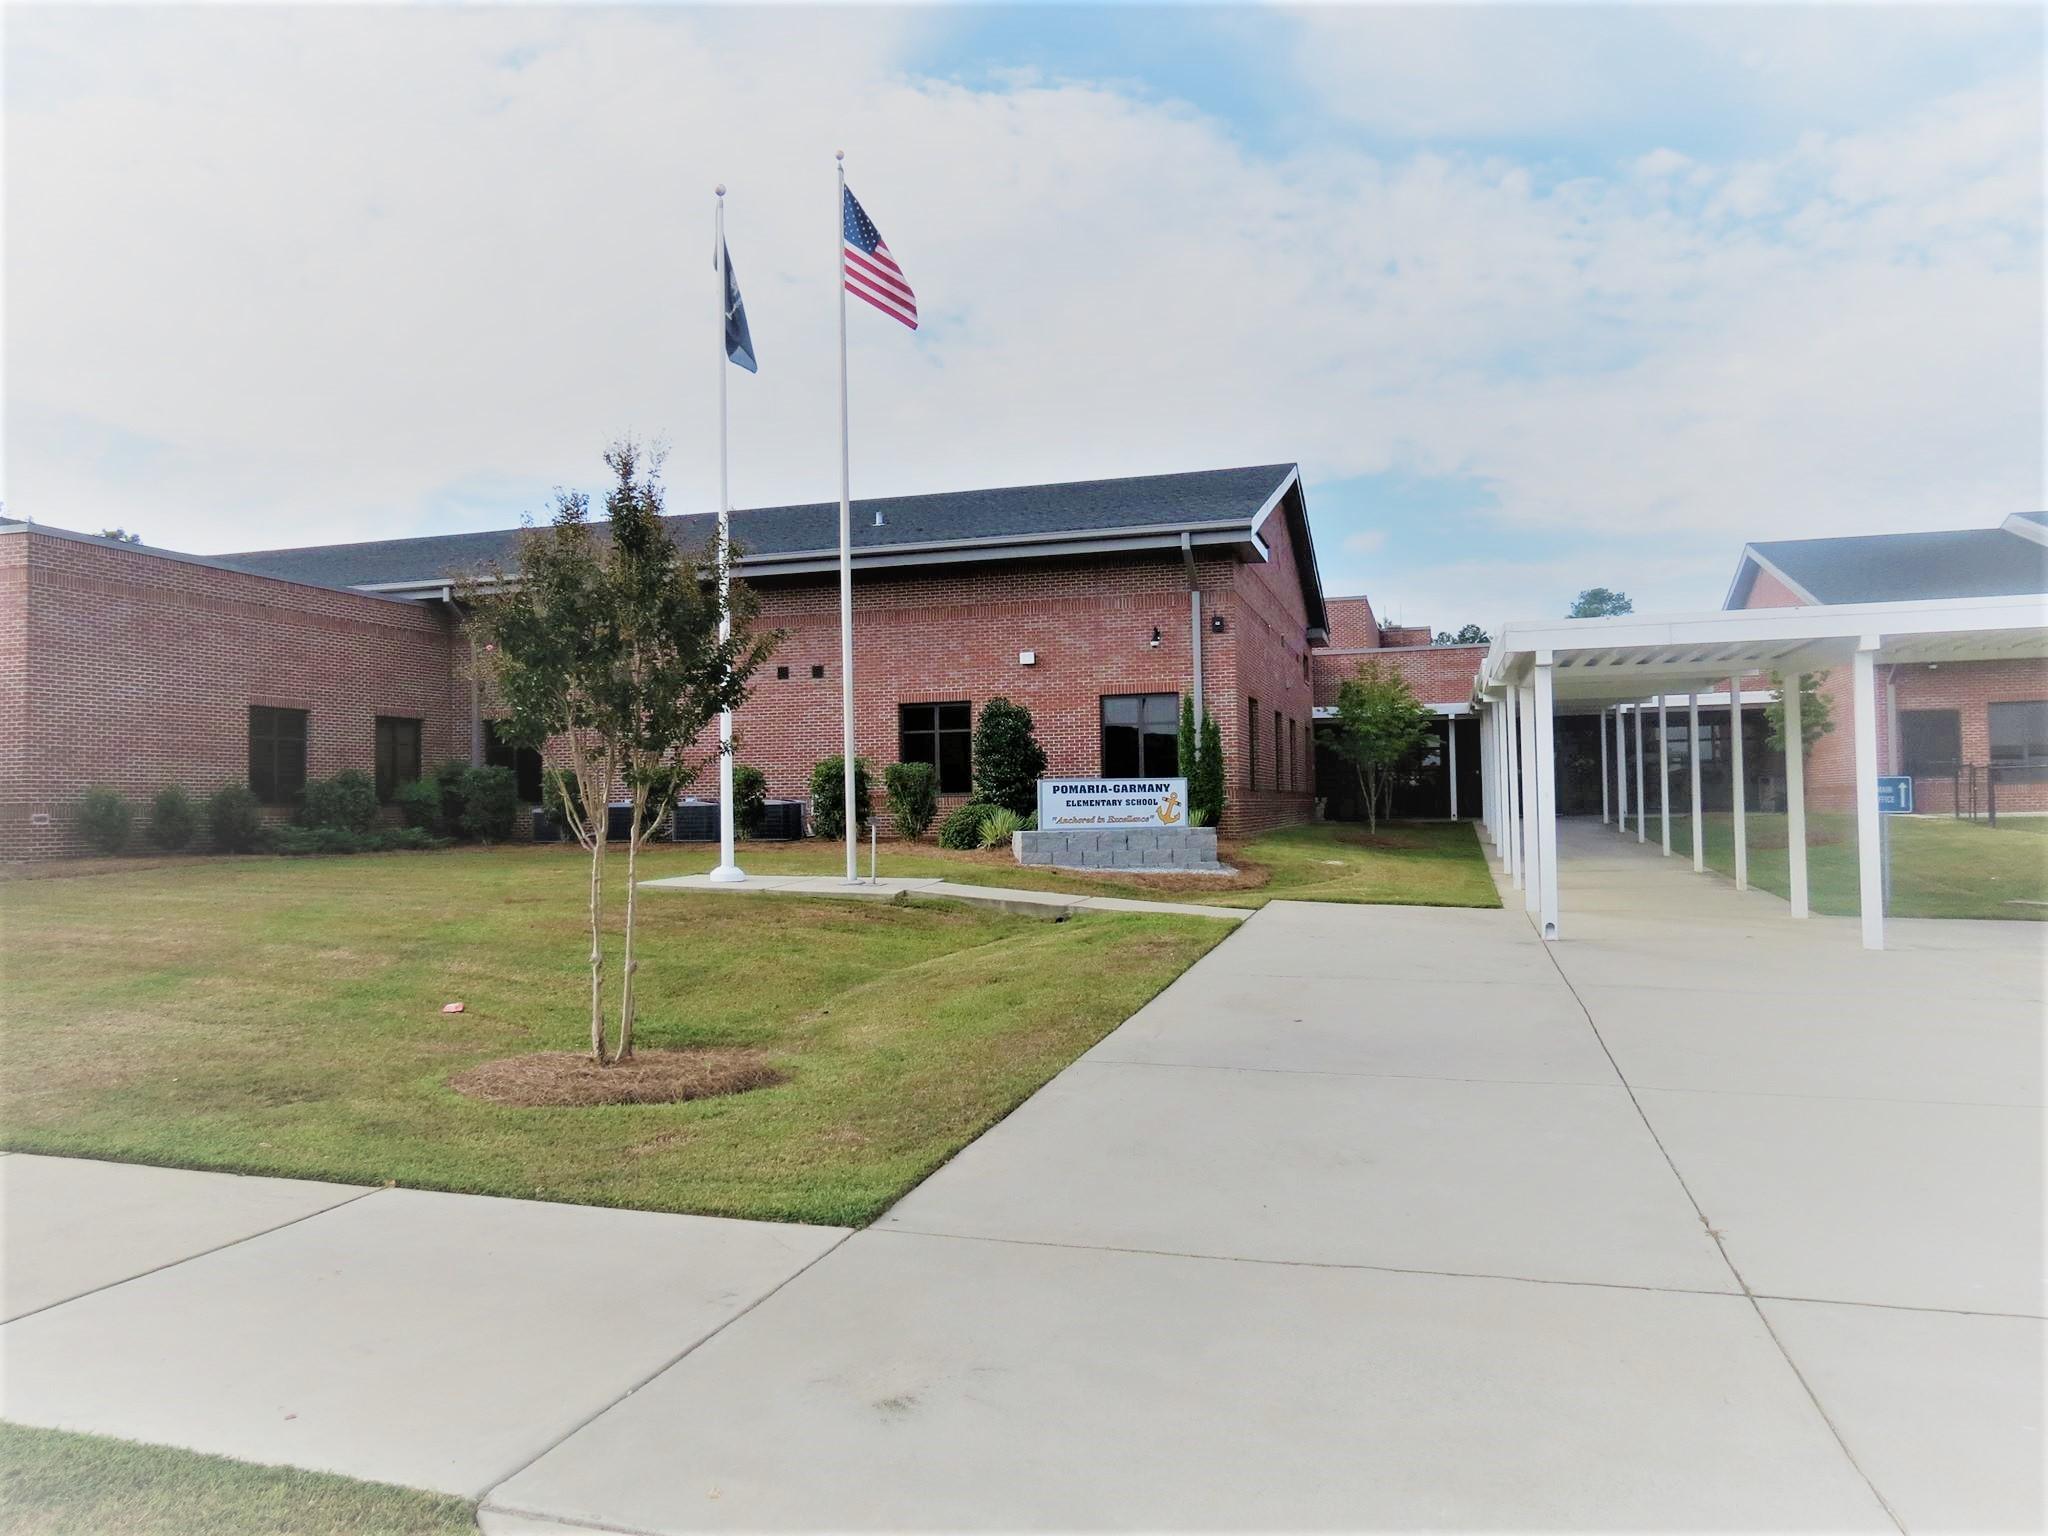 Pomaria-Garmany Elementary School